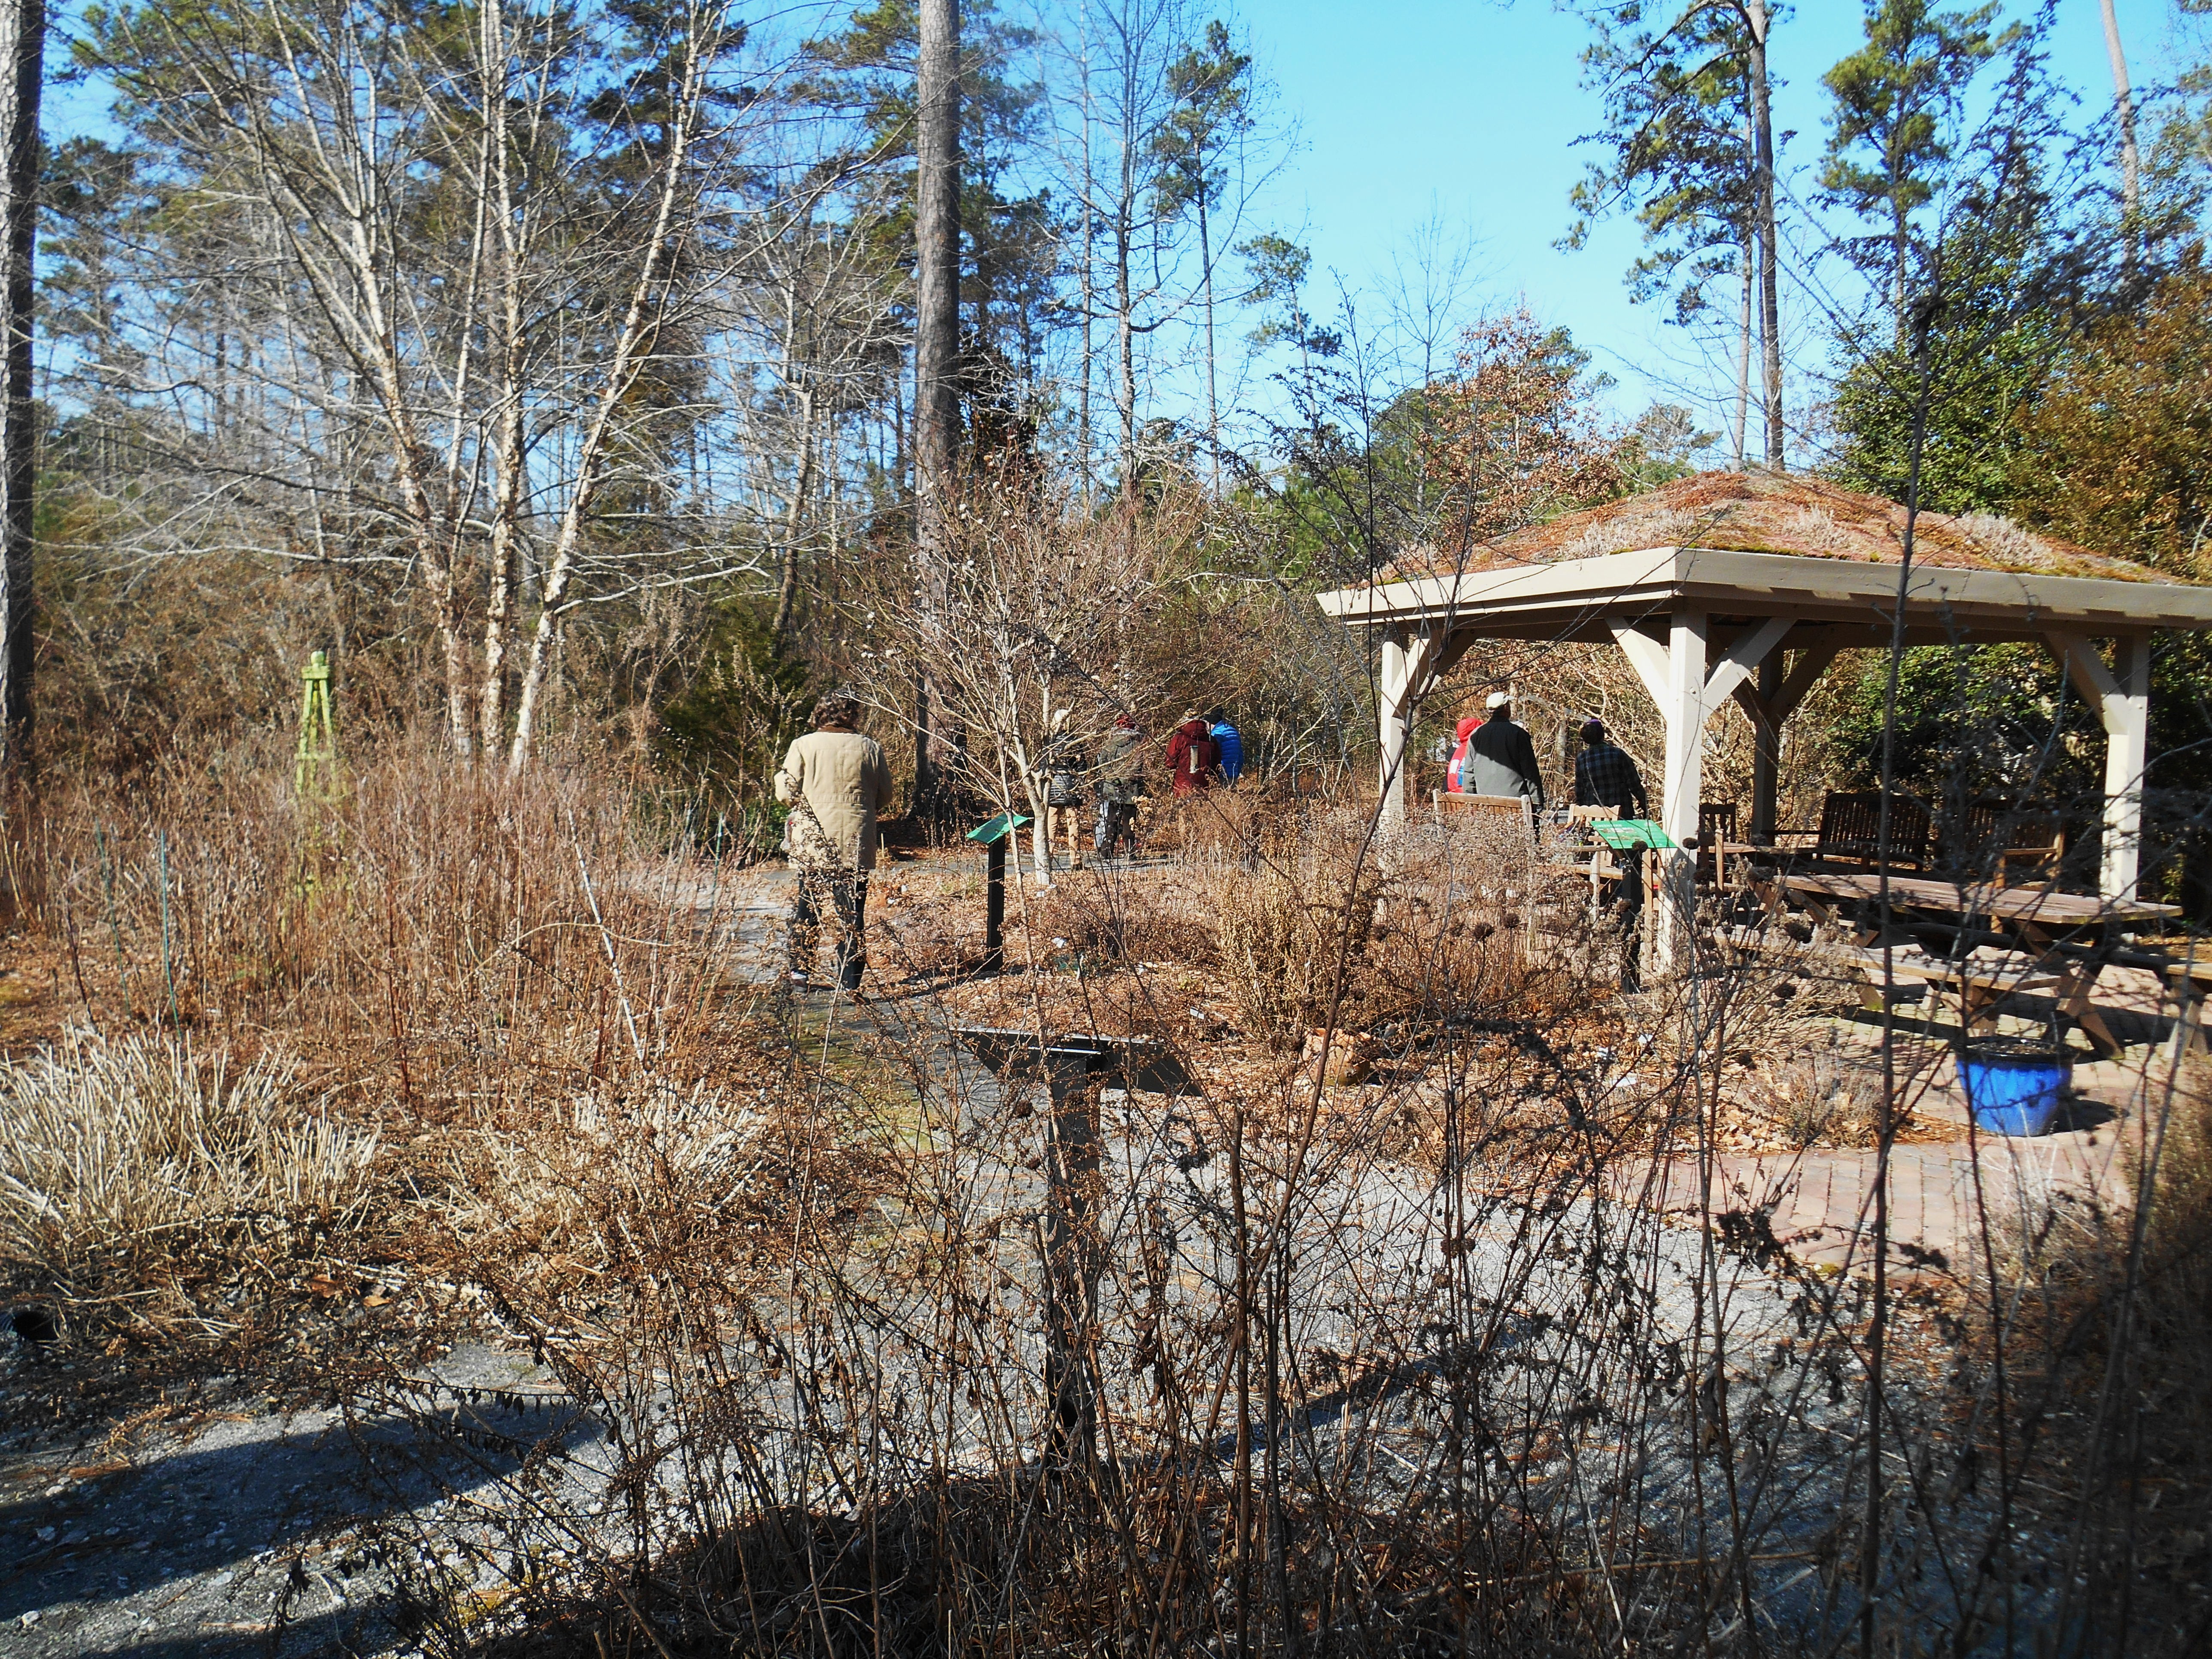 The Williamsburg Botanical Garden